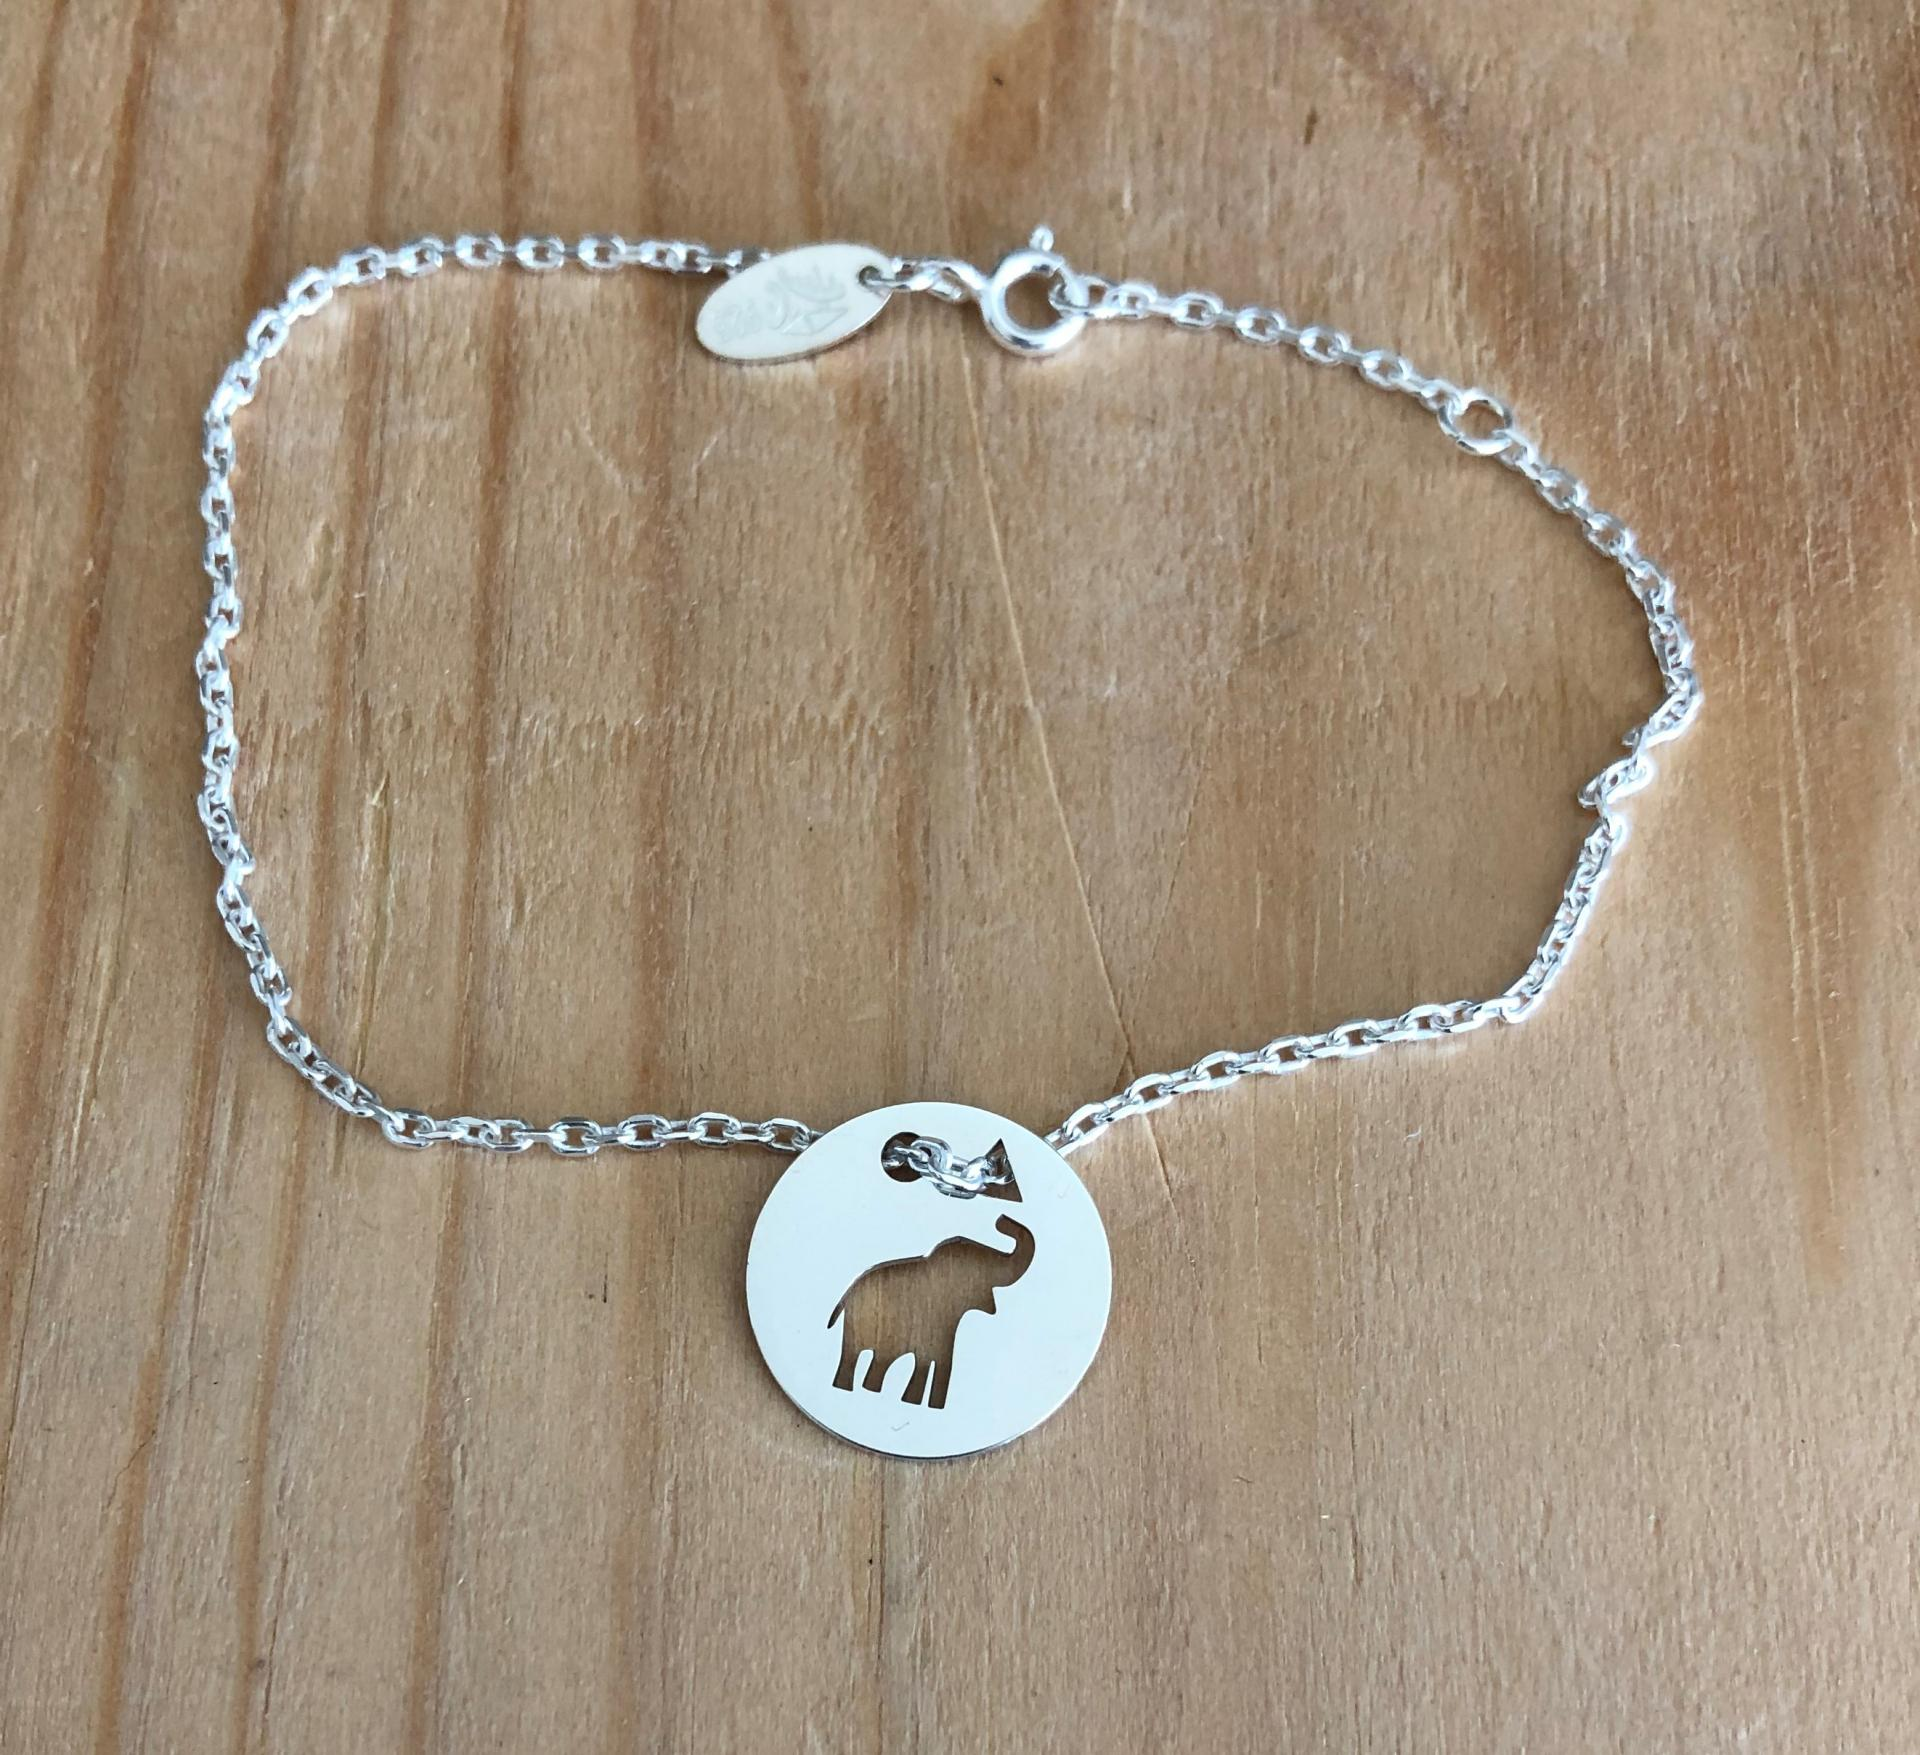 Elephanteau brac chaine